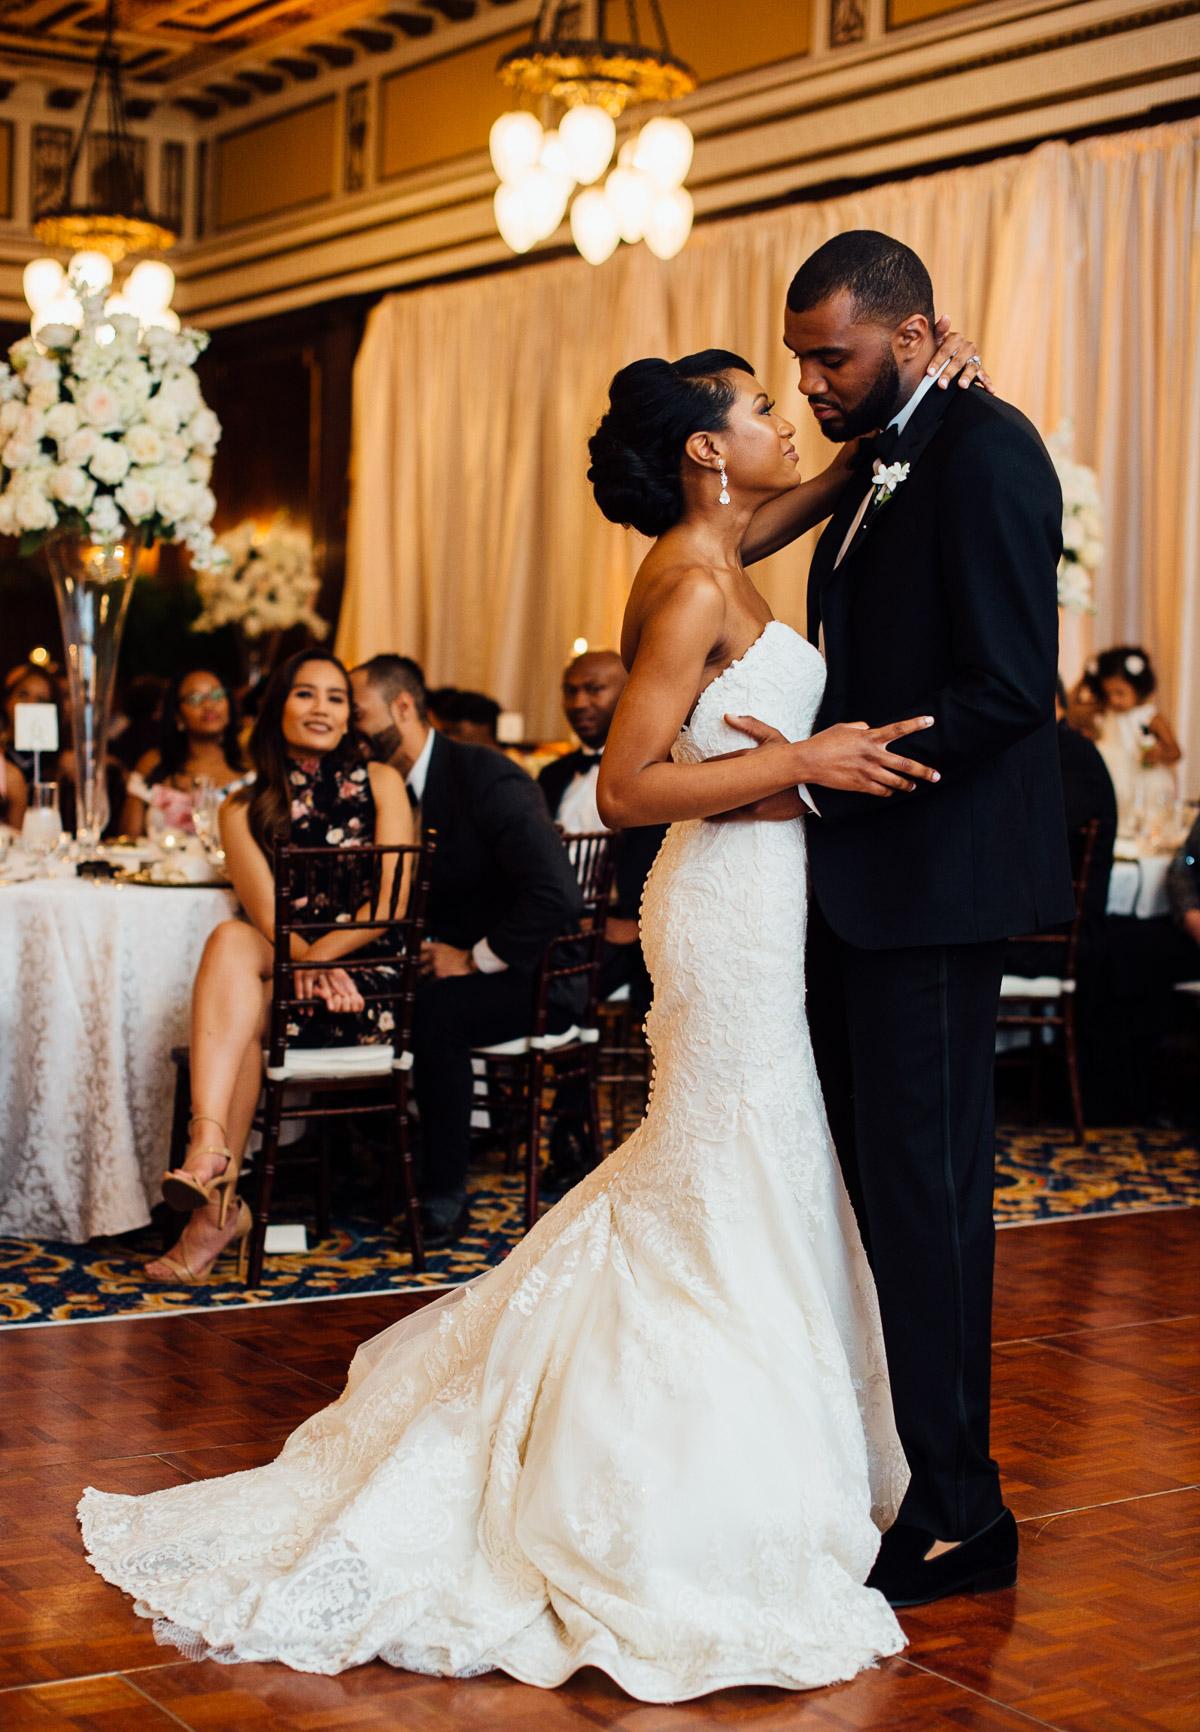 wedding-1-11 Hermitage Hotel Wedding | Barbara and Darrius